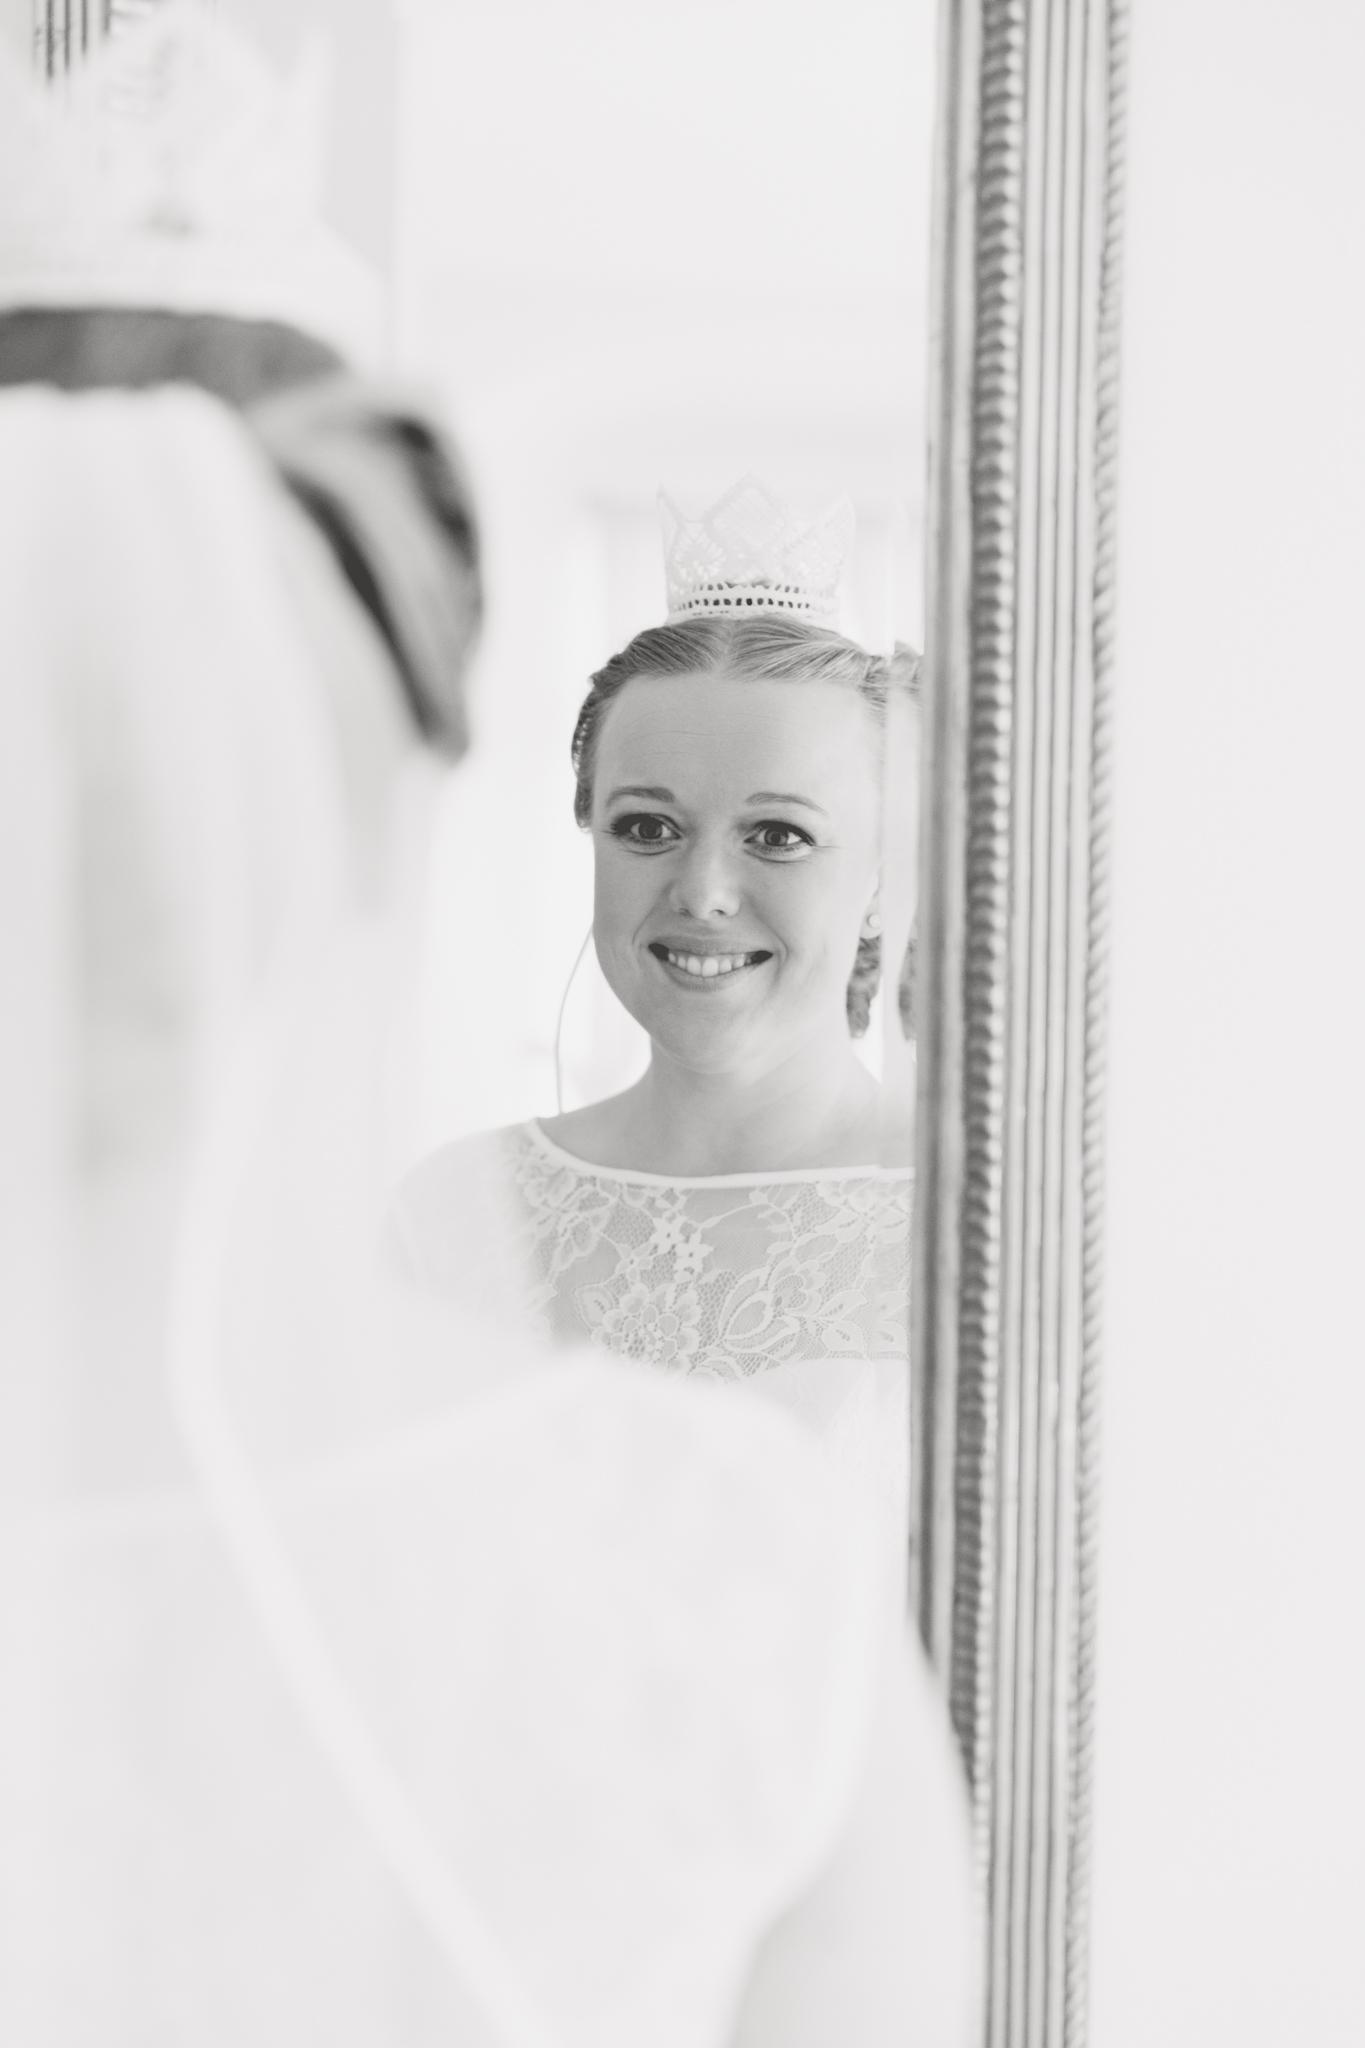 ViOli Photography bröllopsfotograf-Karlshamn-Blekinge-Ronneby-Karlskrona-Sölvesborg-Bromölla-Kristianstad (5 av 35)